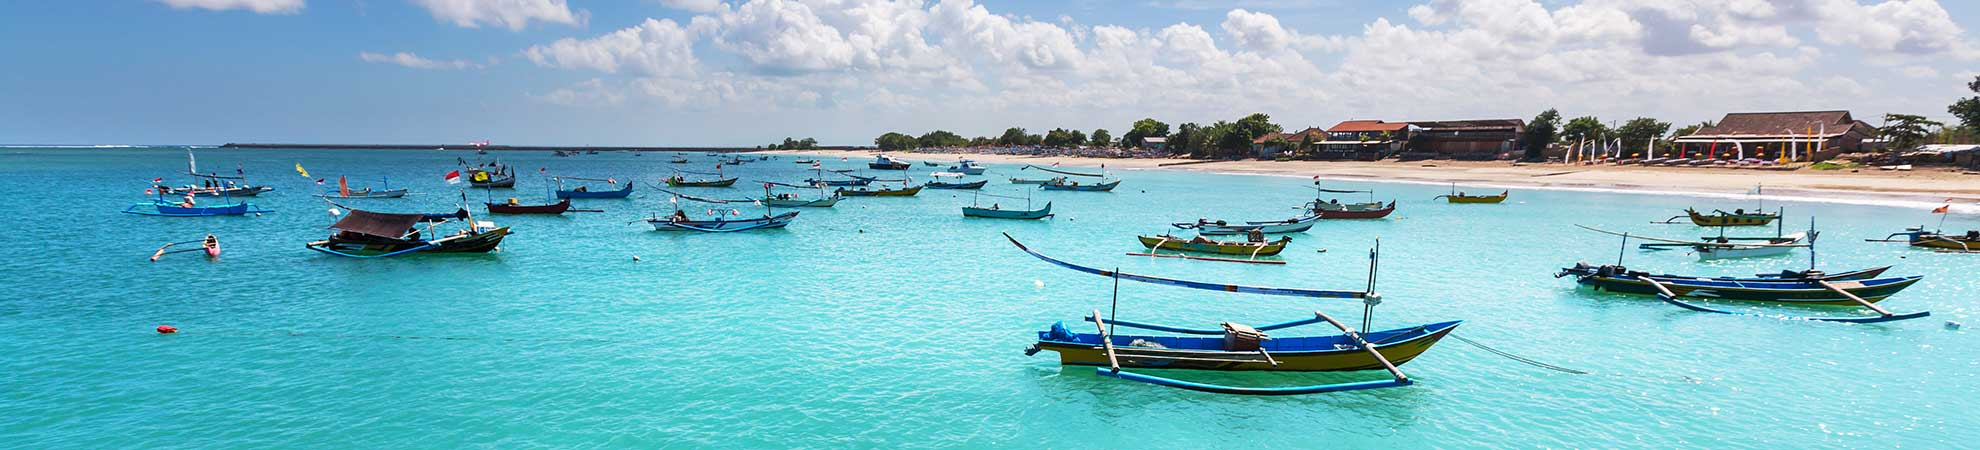 Quand partir à Bali ?